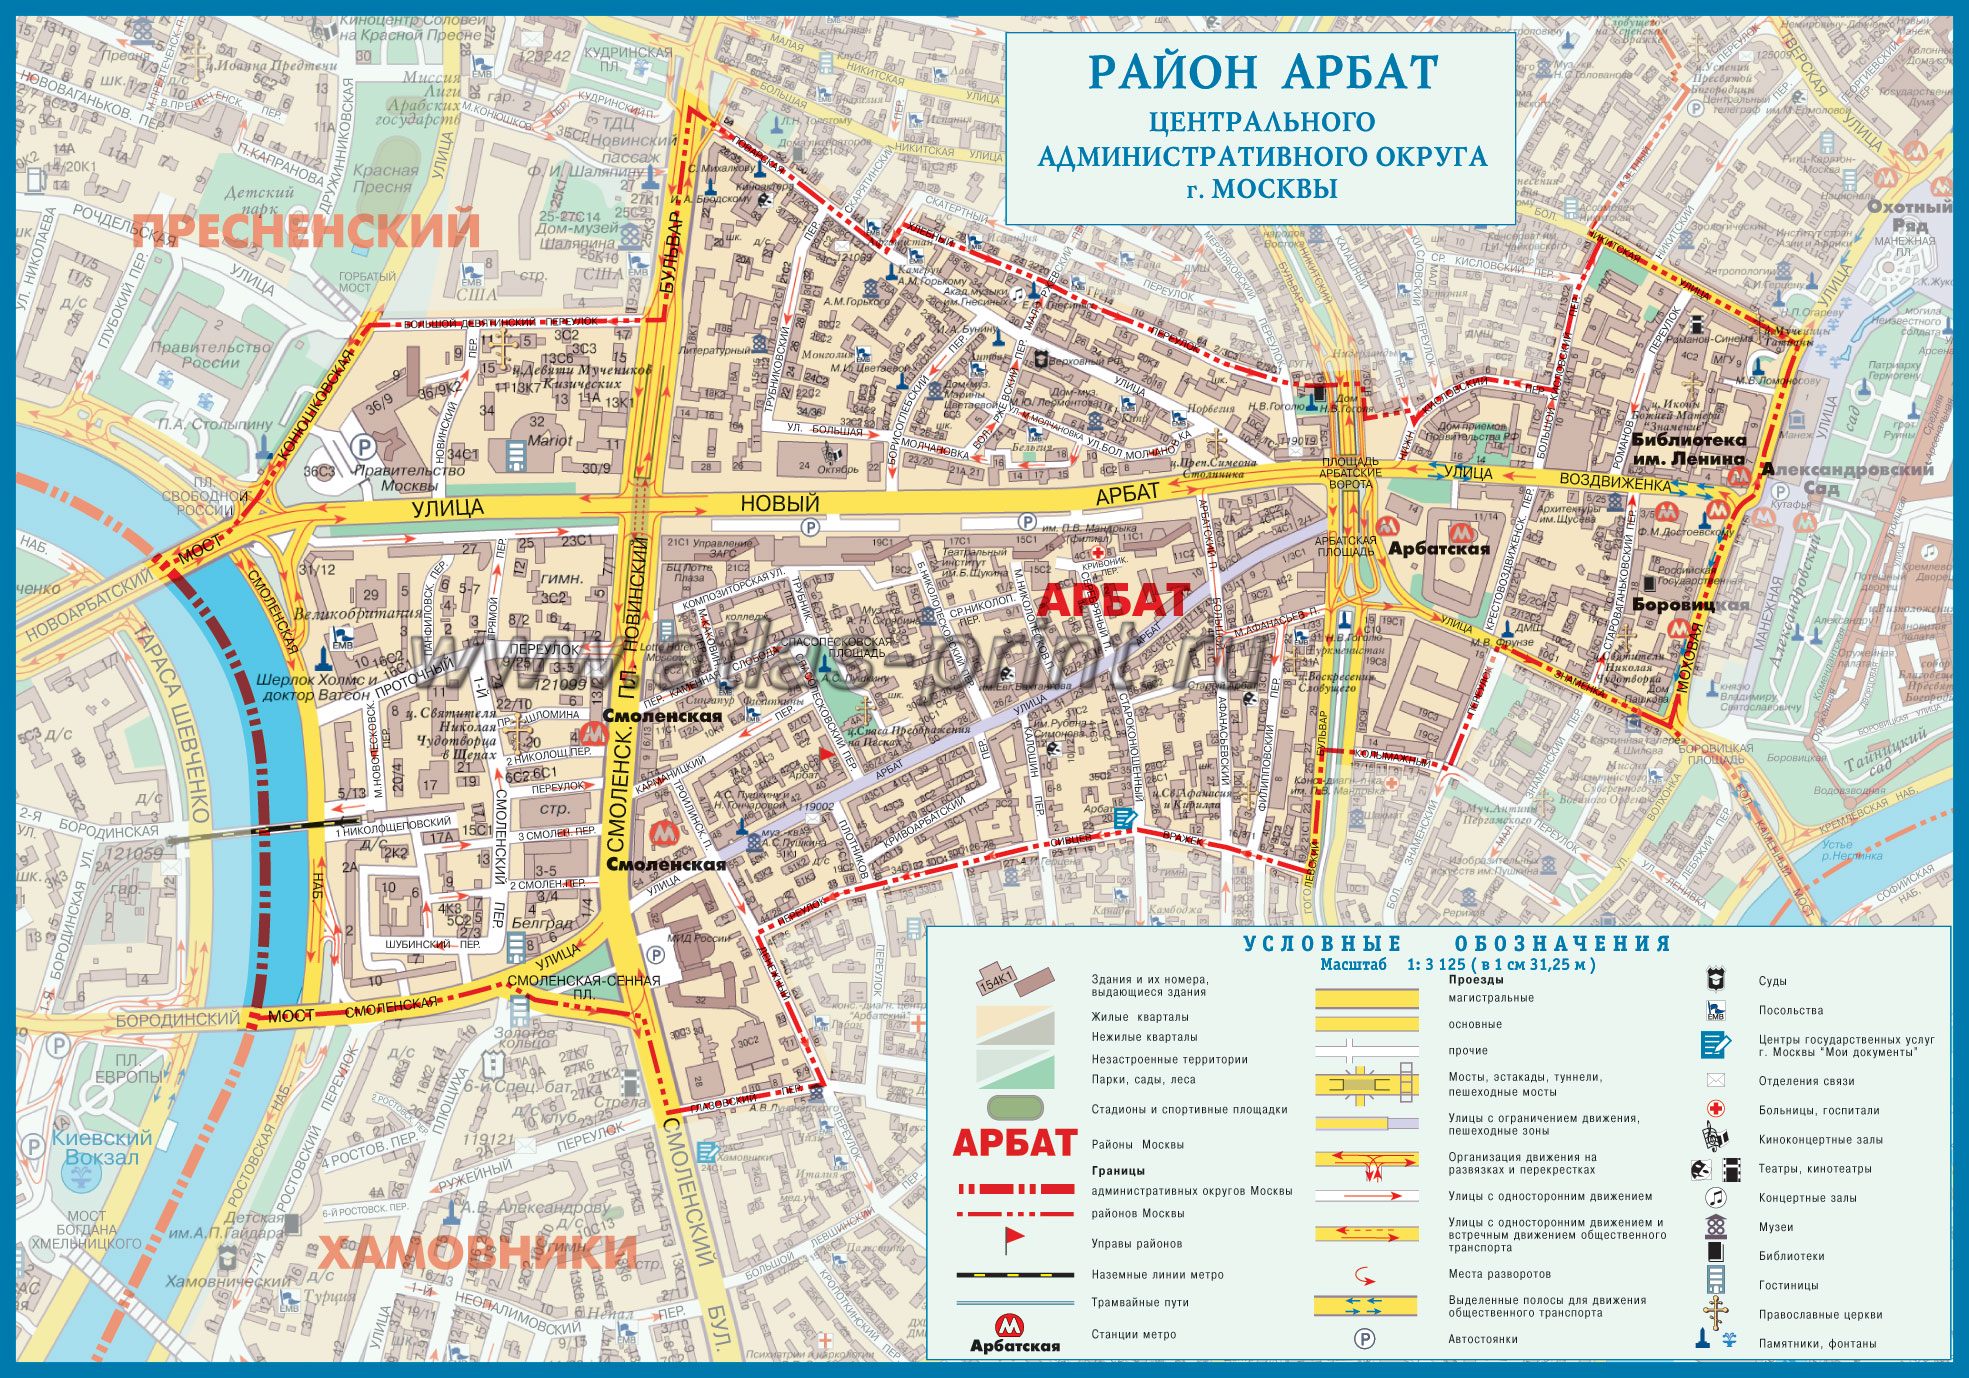 Настенная карта района Арбат г.Москвы 1,00*0,70 м, ламинированная